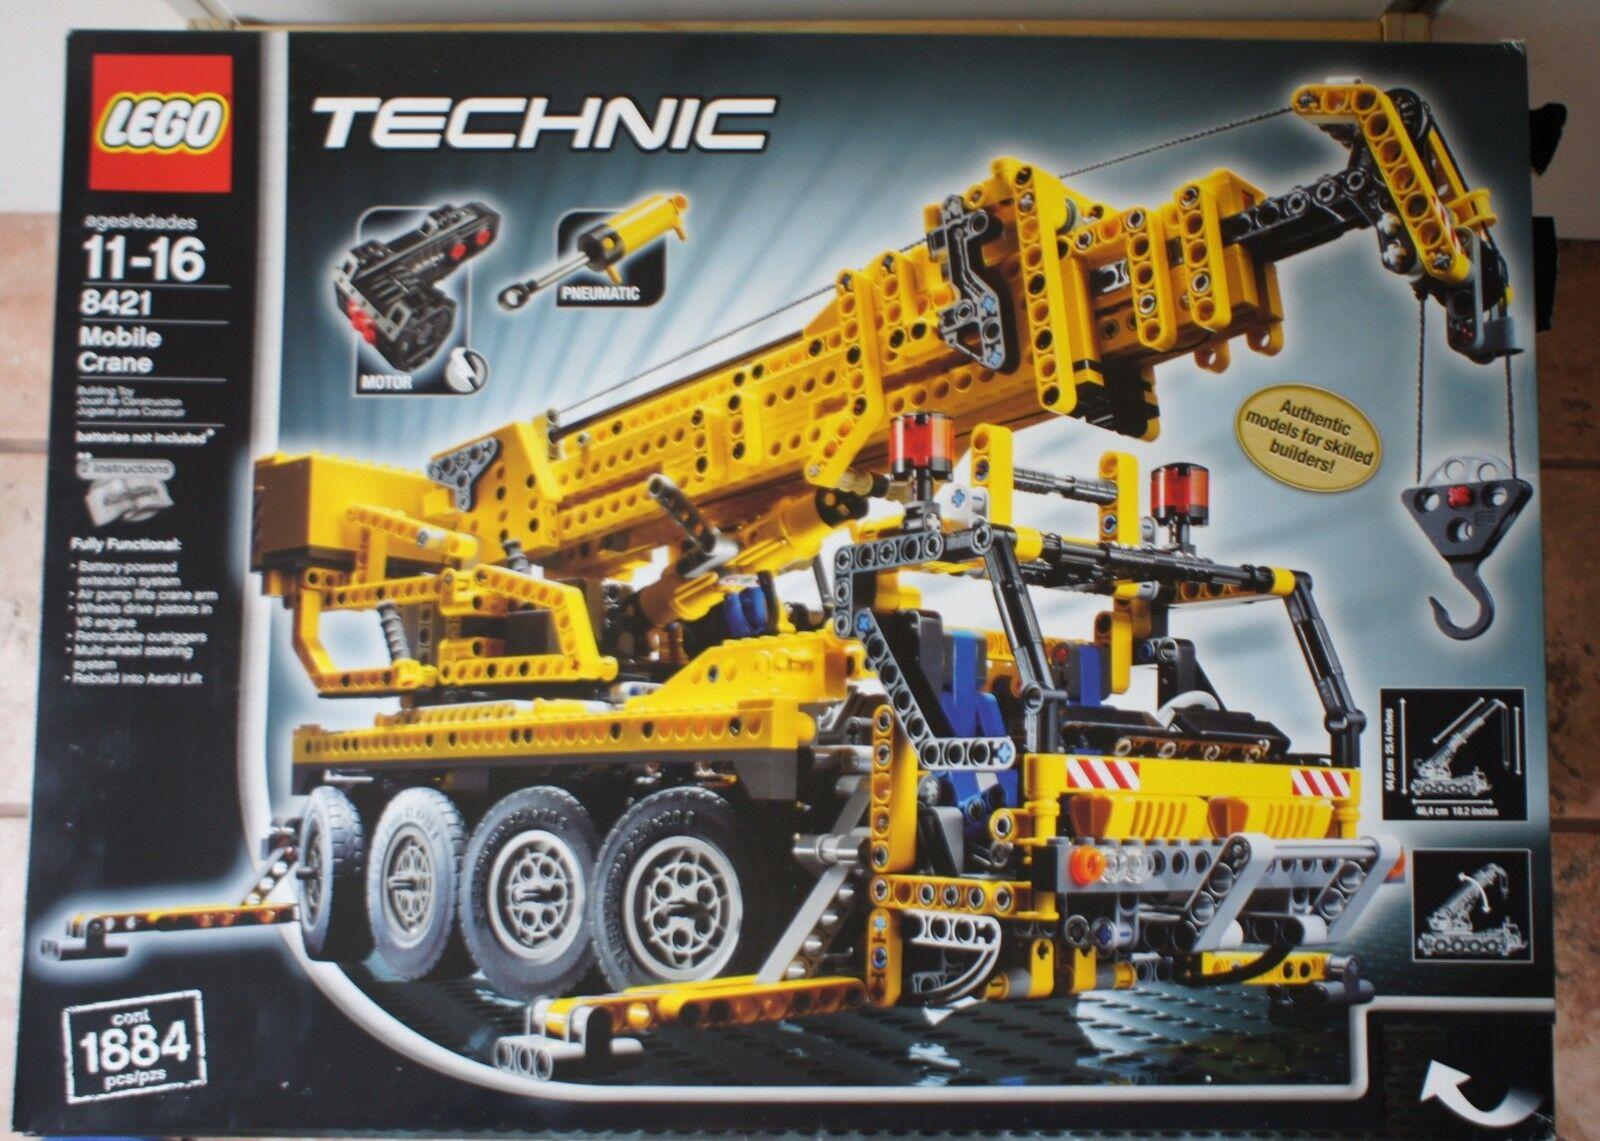 Lego Technic 8421 Mobile Crane - - - Pneumatics - Motorized - Brand New Sealed 30f4de